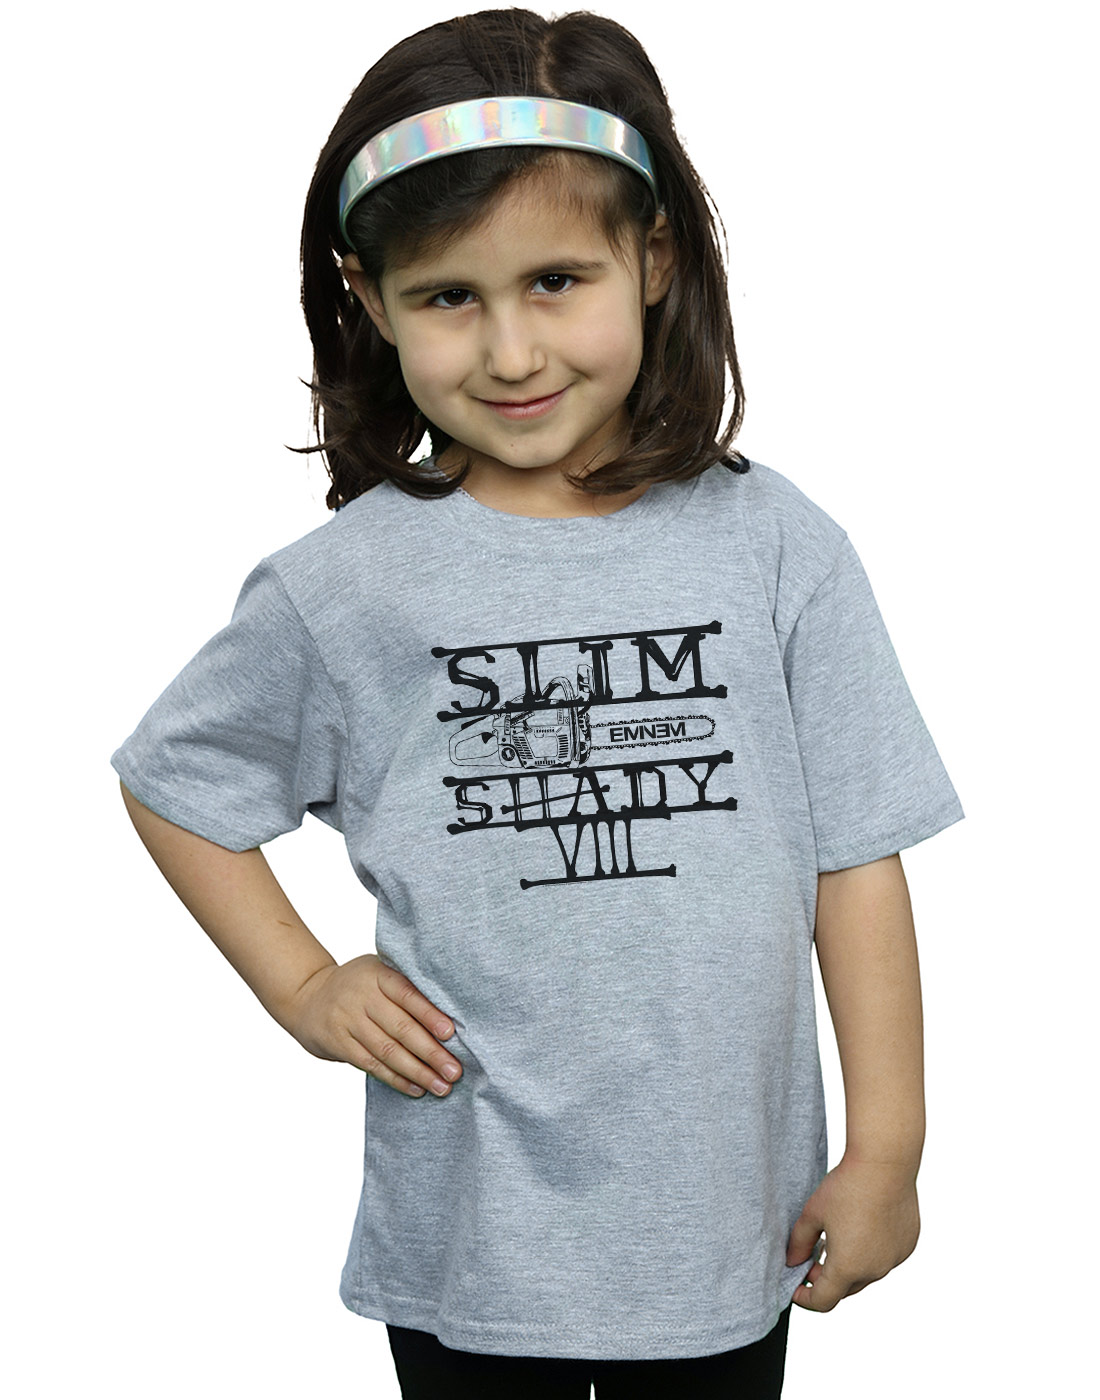 65e9570e84394d Eminem girls slim shady chainsaw shirt ebay jpg 1100x1400 Slim shady  chainsaw art